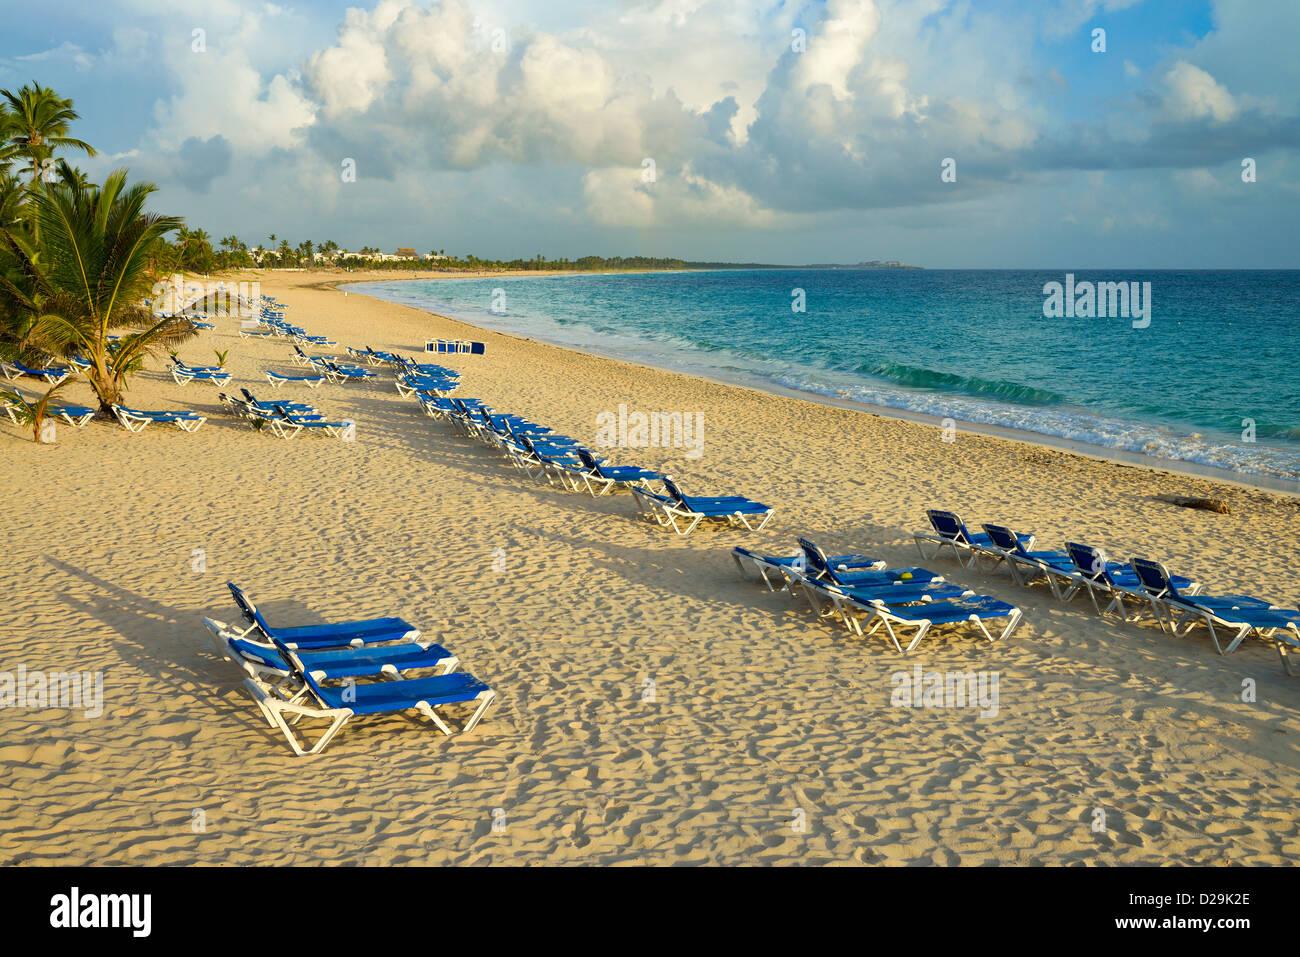 Spiaggia di sunrise, Punta Cana, Repubblica Dominicana, dei Caraibi Immagini Stock